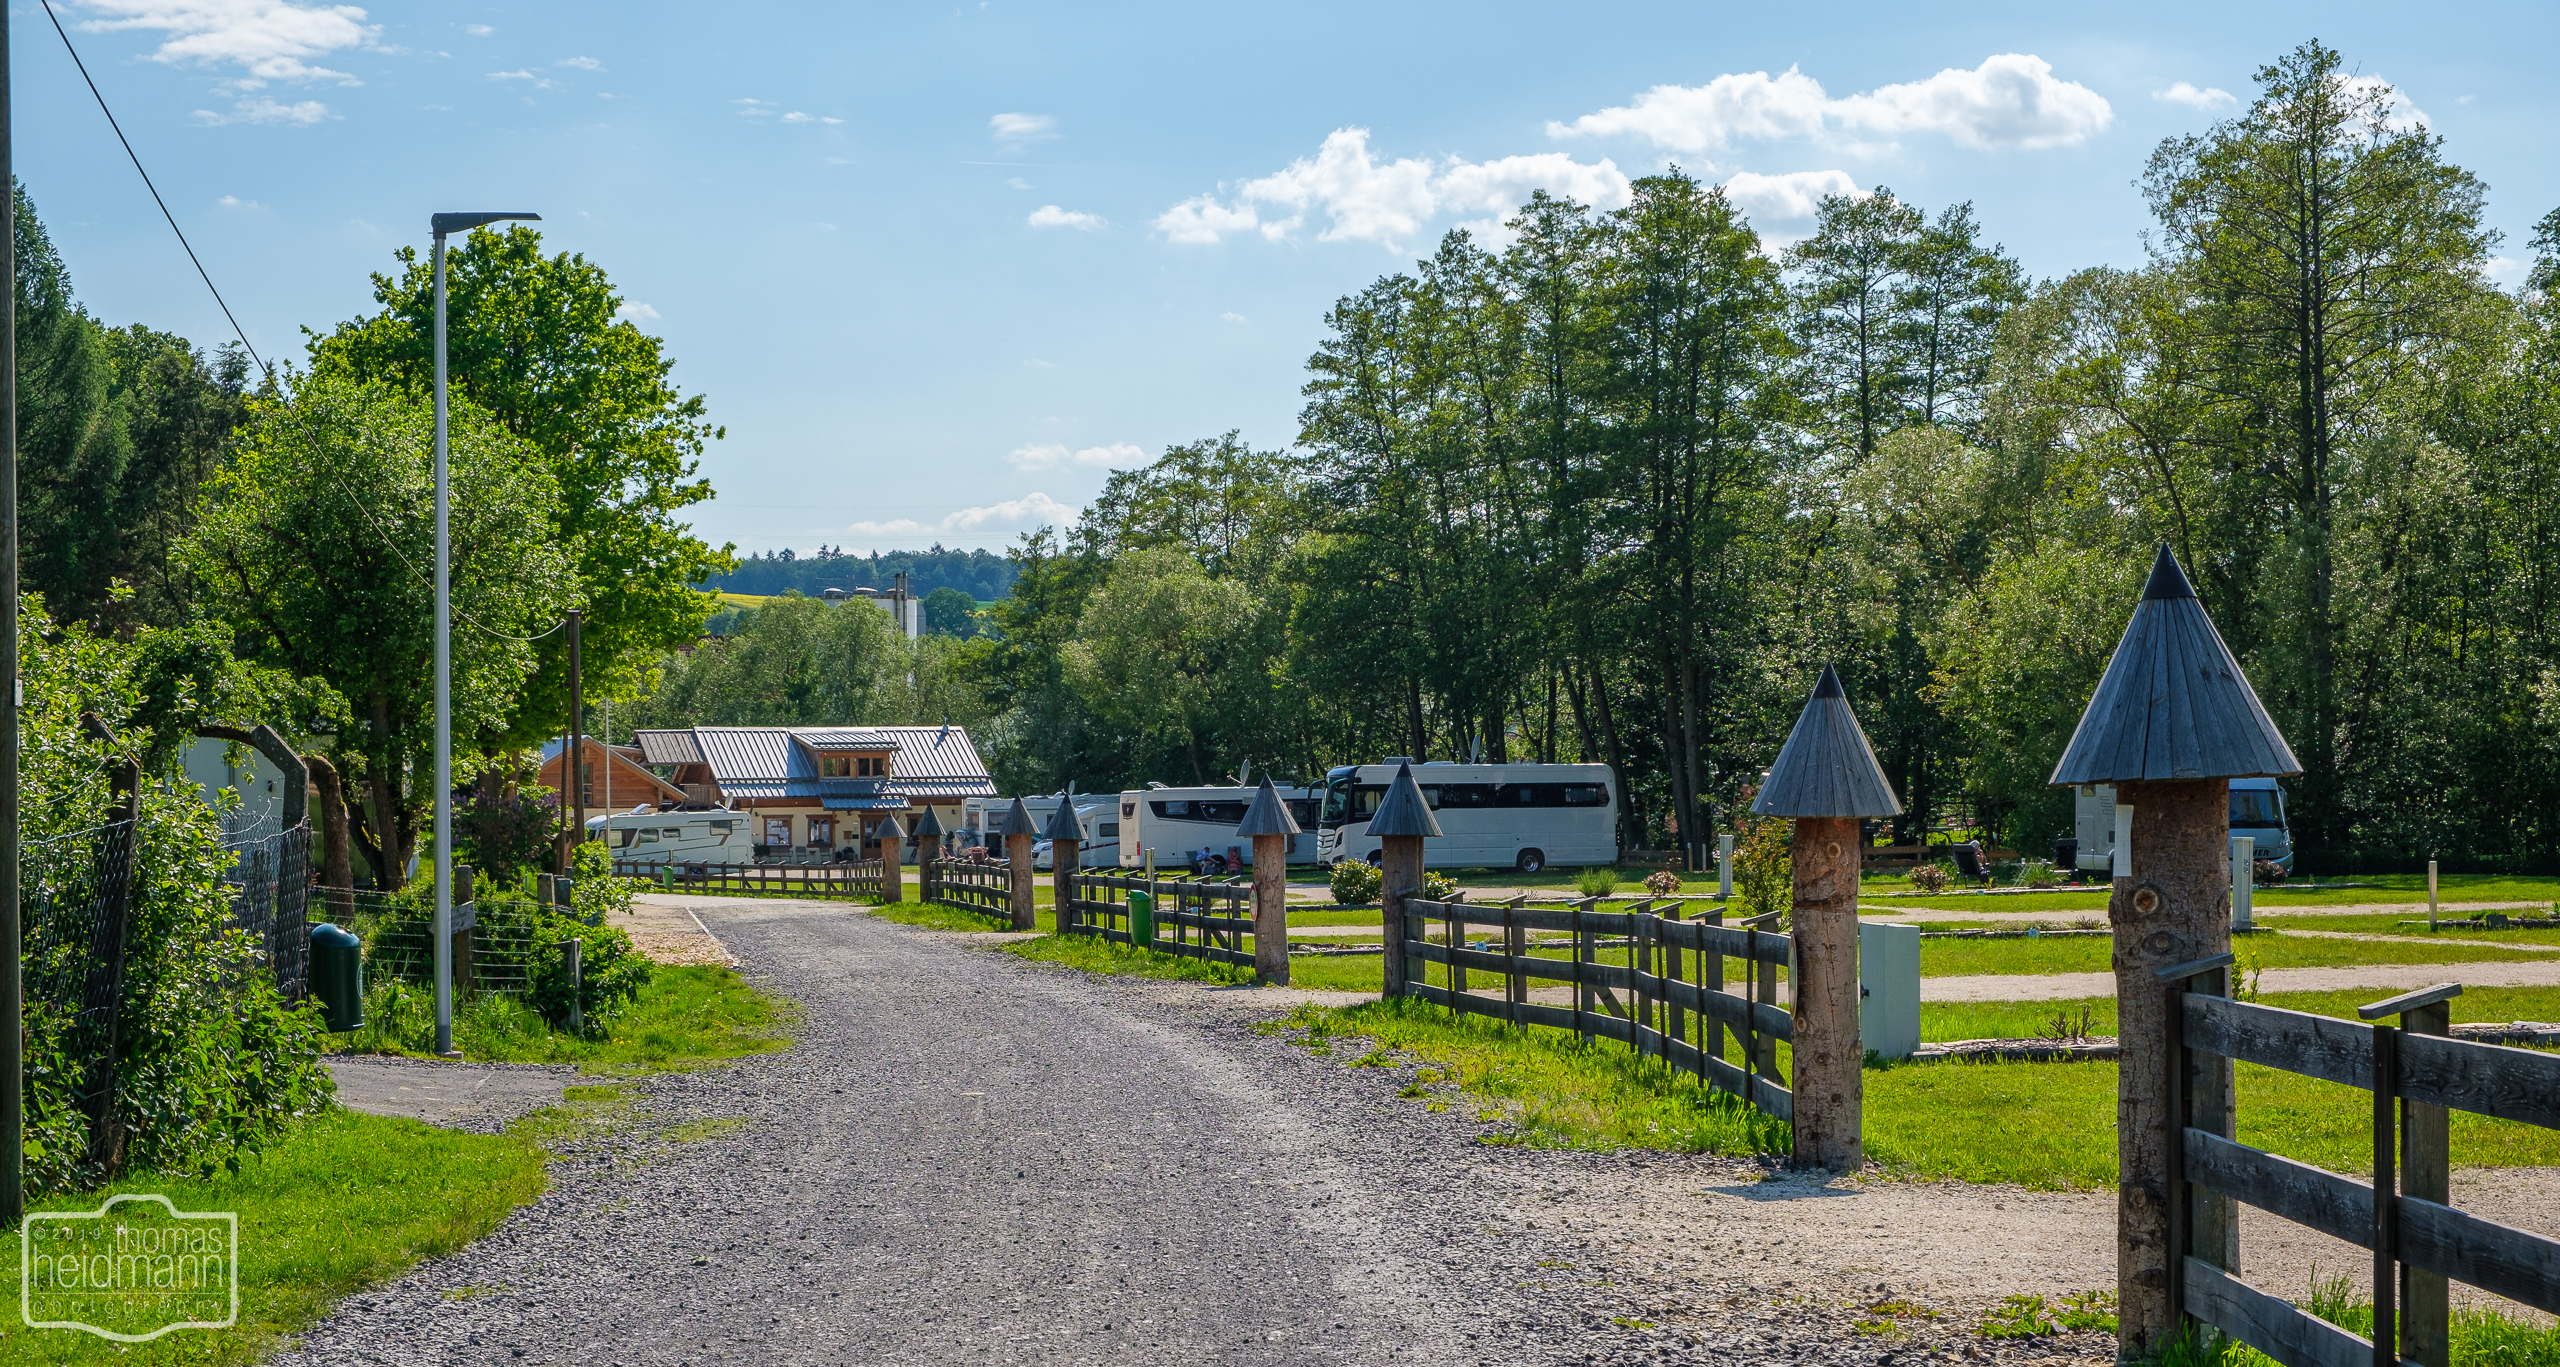 Reisemobilpark Urbachtal in Neukirchen